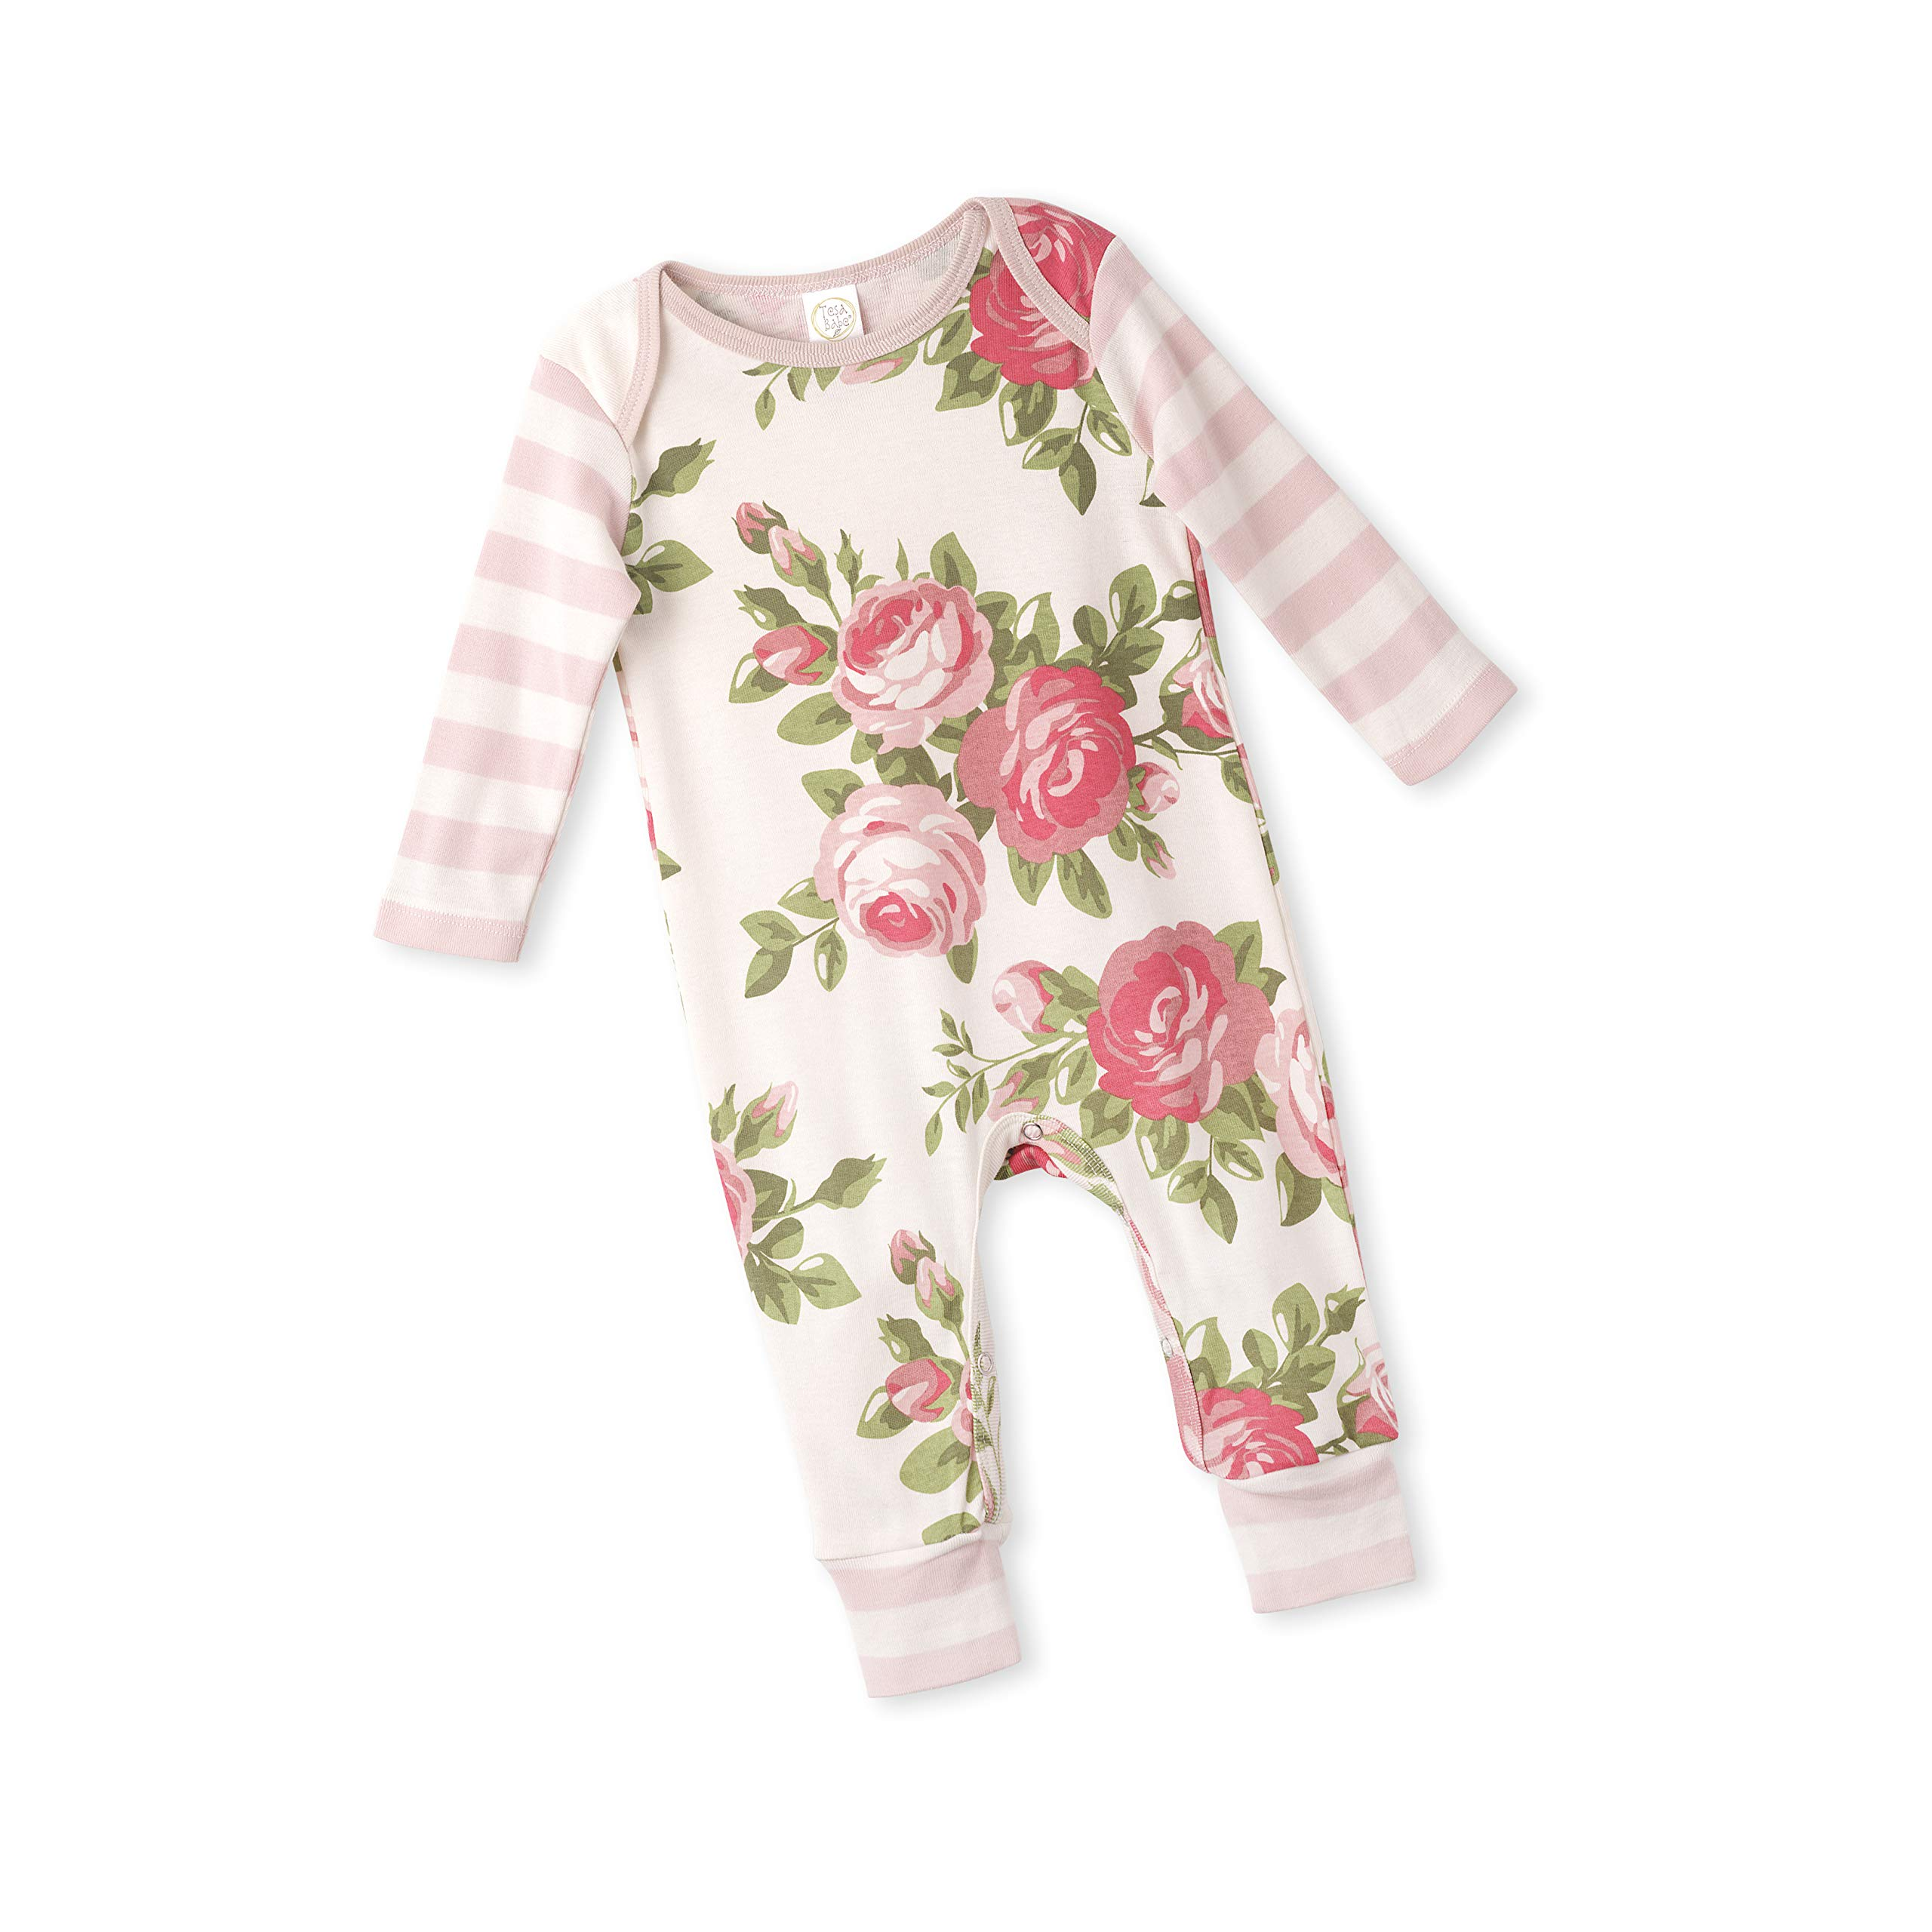 Tesa Babe Spring Summer Floral Romper for Newborns Baby Girls /& Toddlers Multi